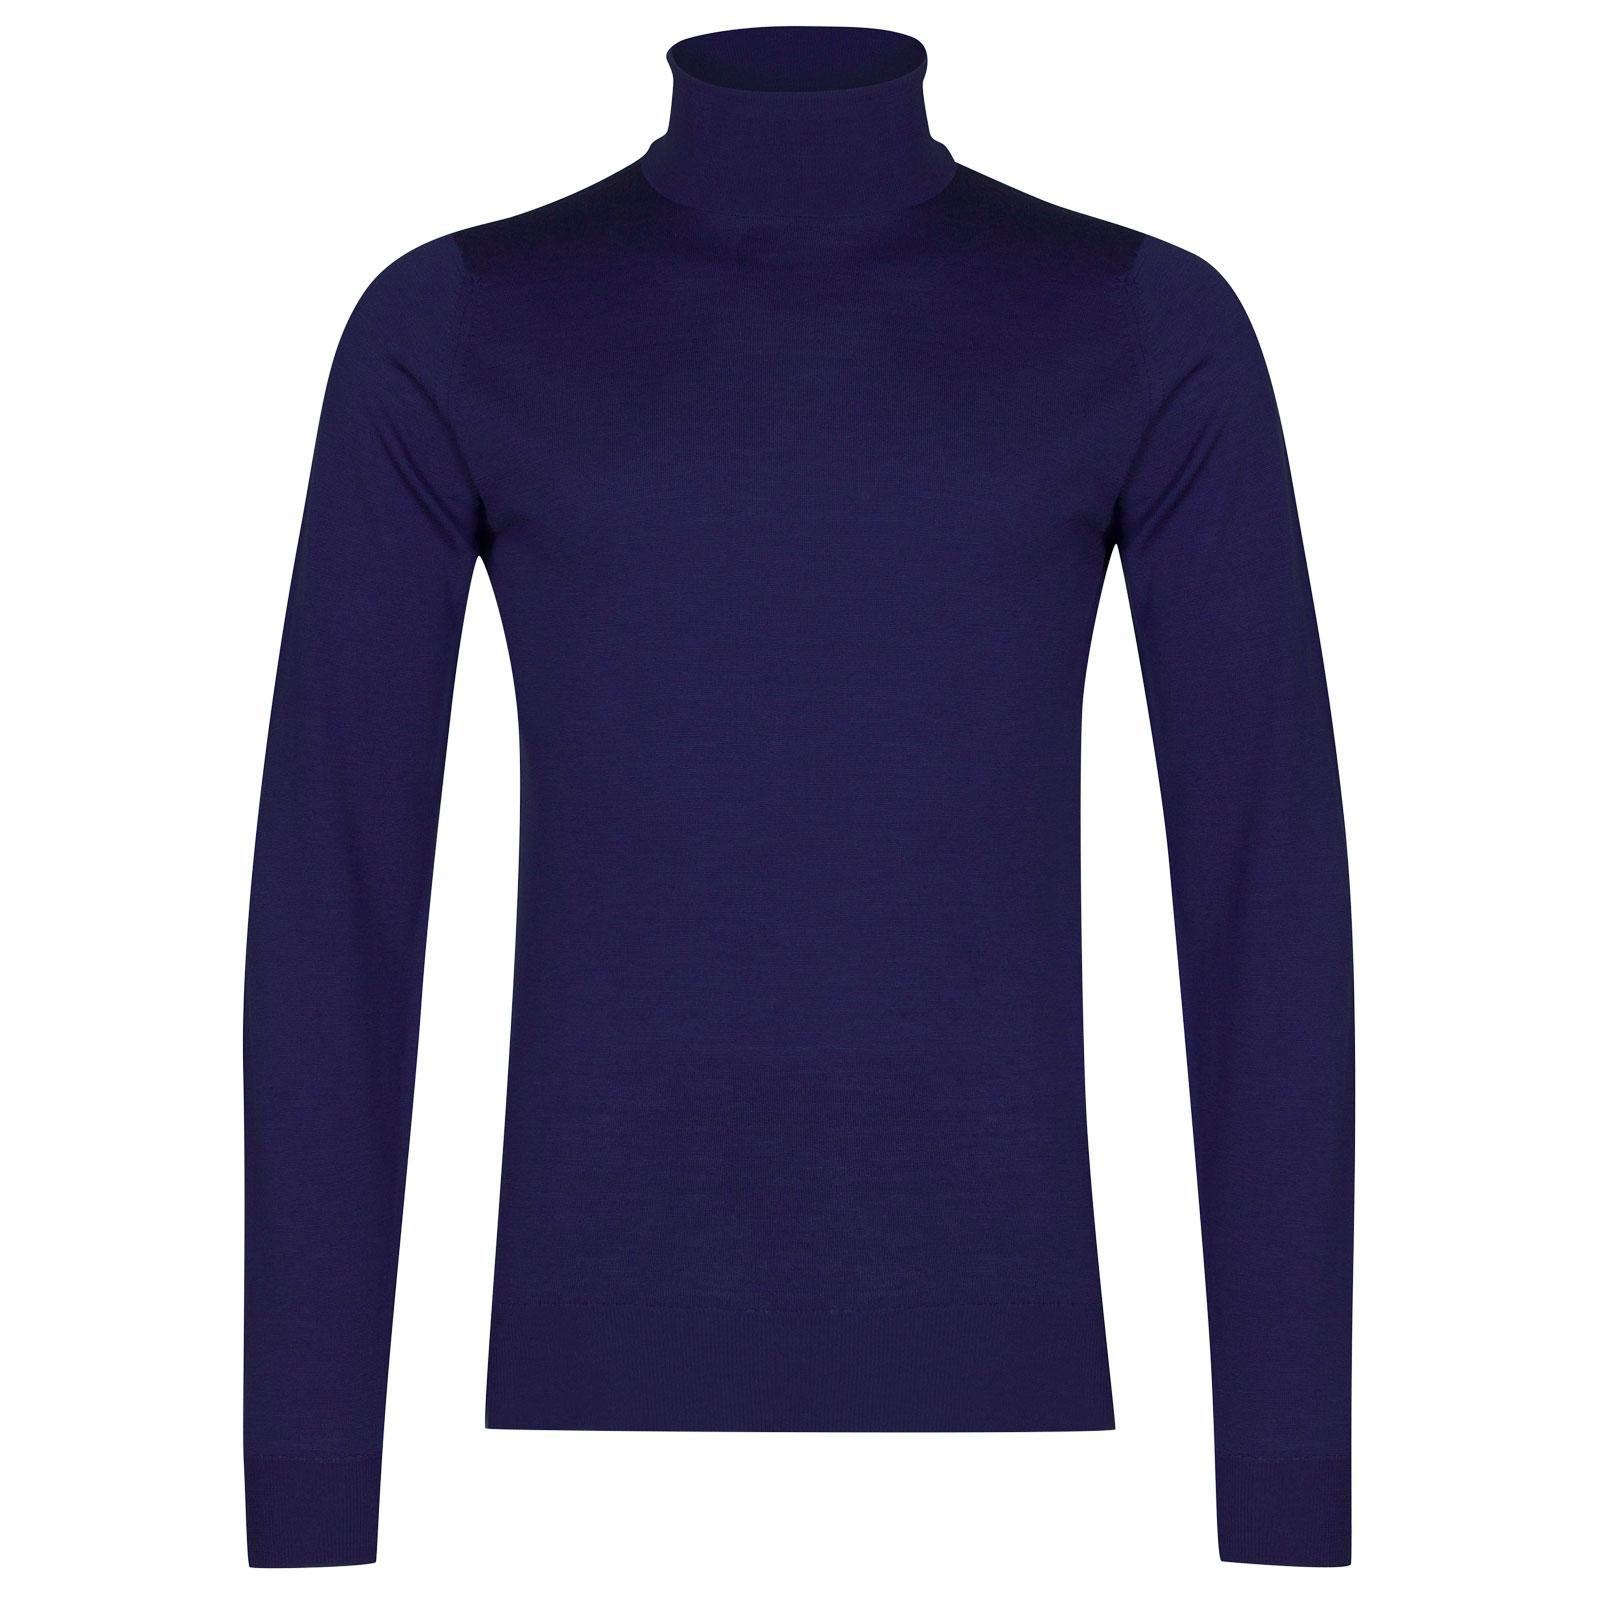 John Smedley Cherwell Merino Wool Pullover in Serge Blue-M